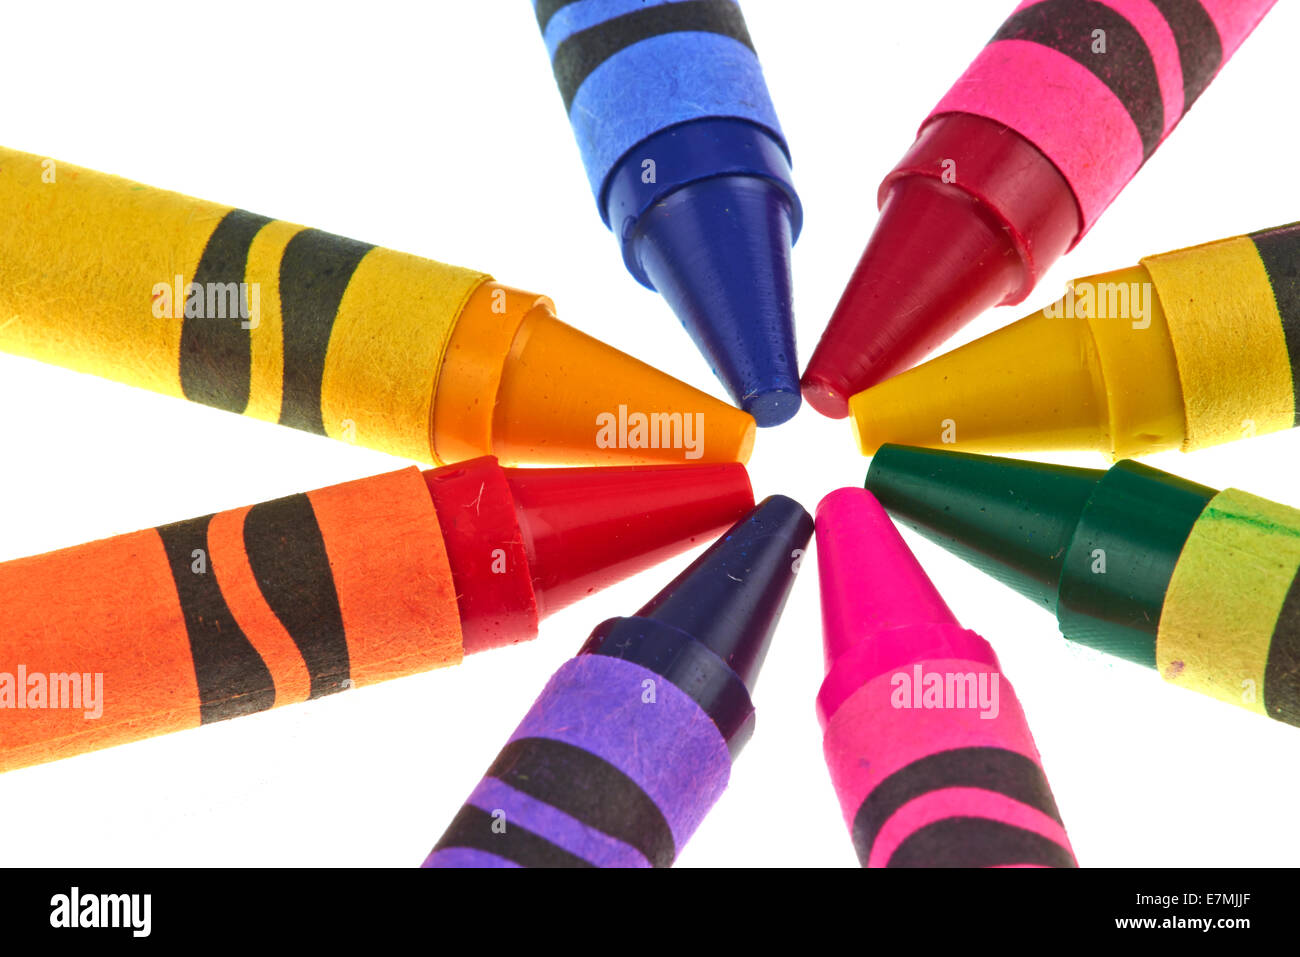 coloured crayola crayons arranged in a circle